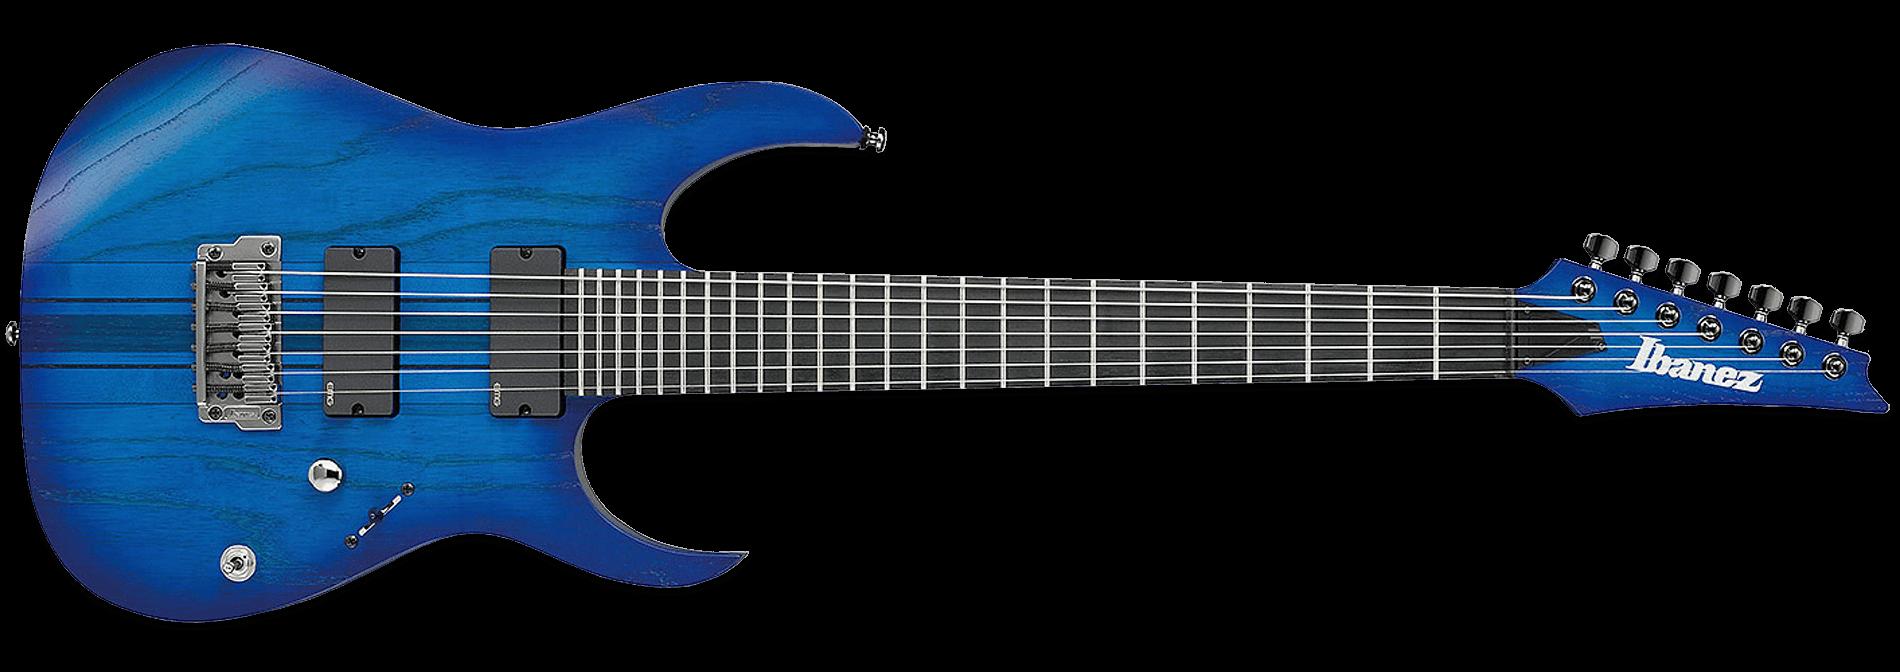 Ibanez Iron Label RGIT27FE Sapphire Blue